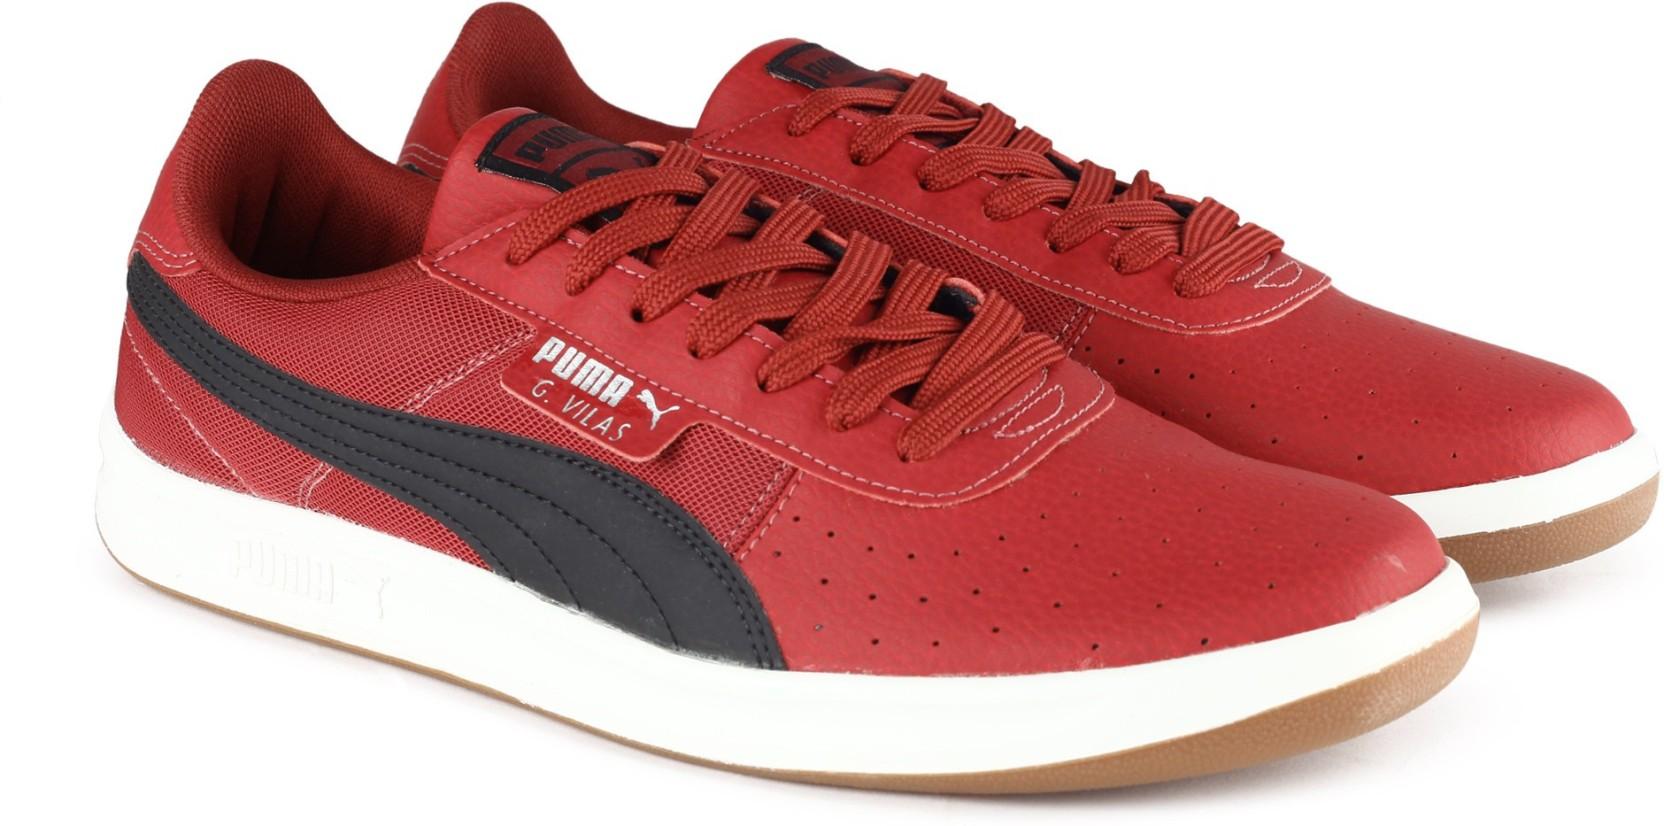 1fa066ee3cdf50 Puma G. Vilas 2 Core IDP Sneakers For Men - Buy Tibetan Red-Puma ...